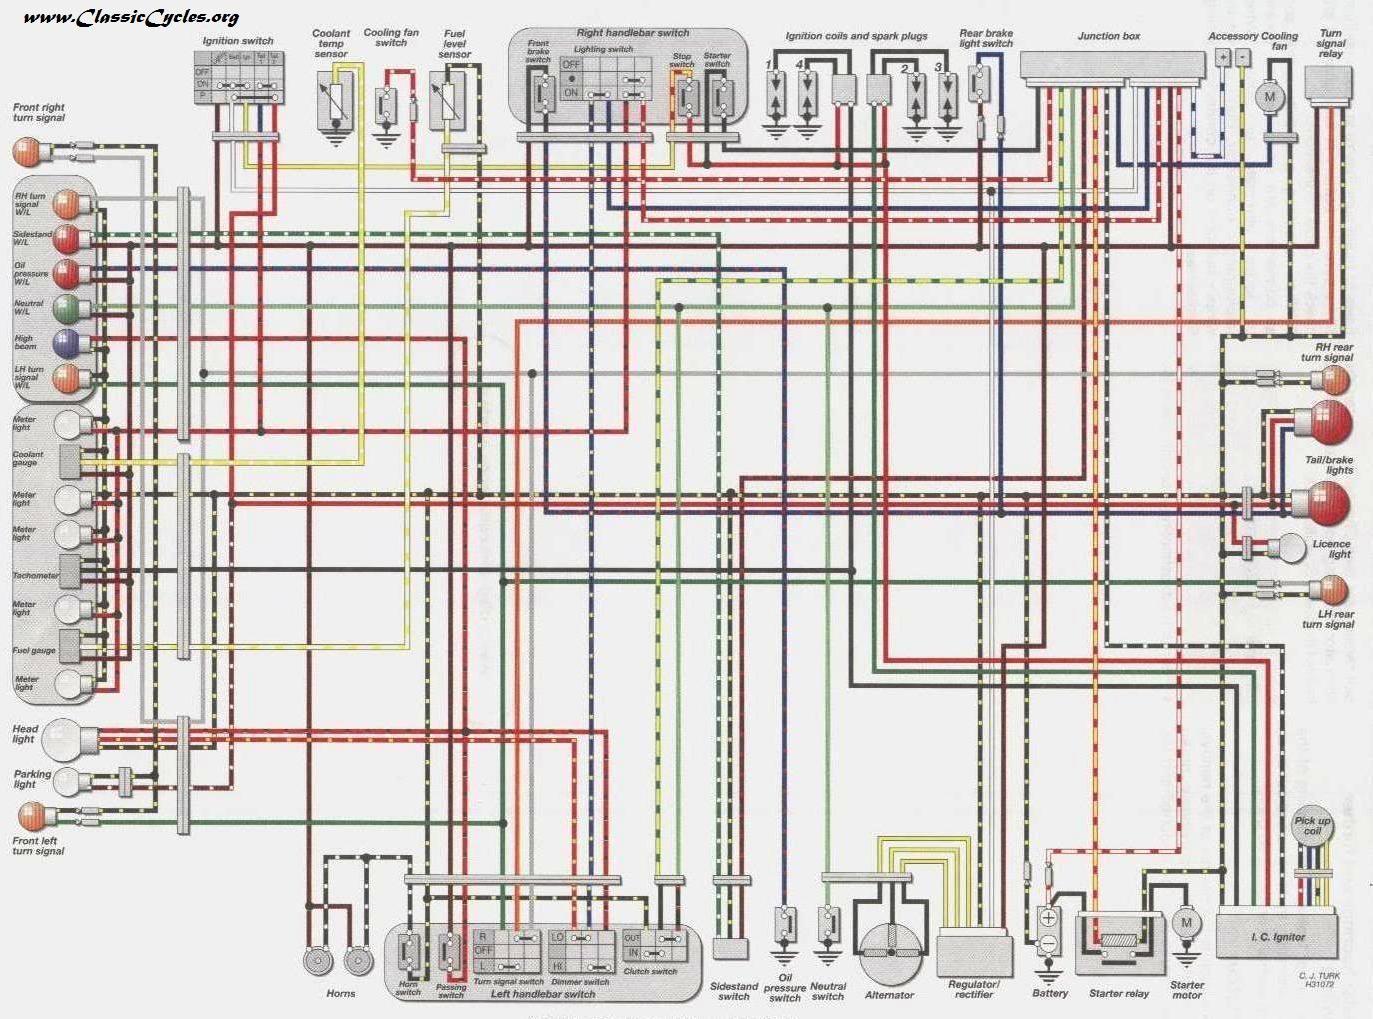 motorcycle alarm system wiring diagram golf cart battery ez go 1989 kawasaki diagrams